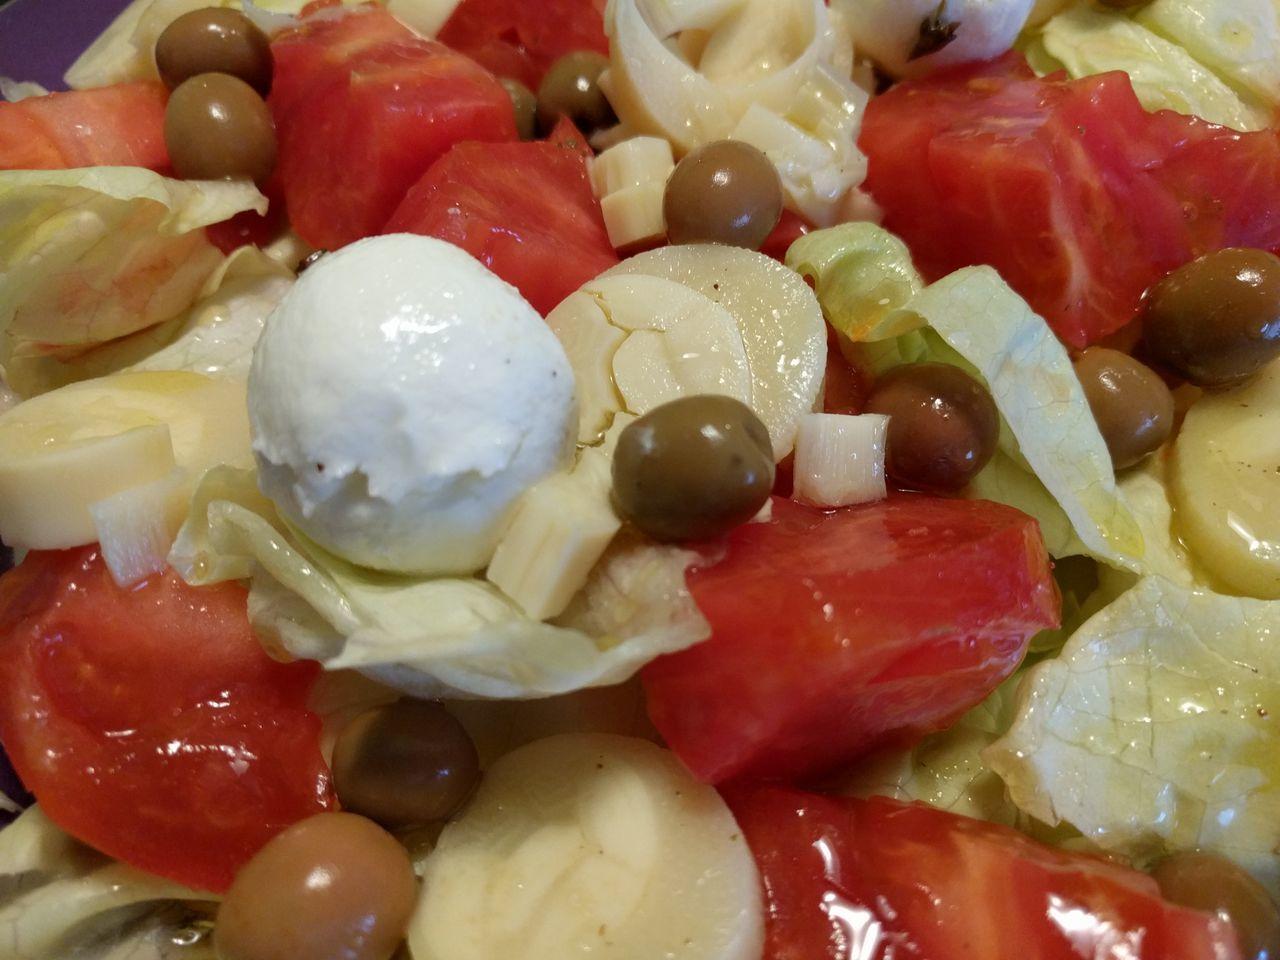 Ensalada Lechuga Tomate Palmito Olivas Queso Aceite Sal Vinagre Vinagreta Comida Street Food Worldwide